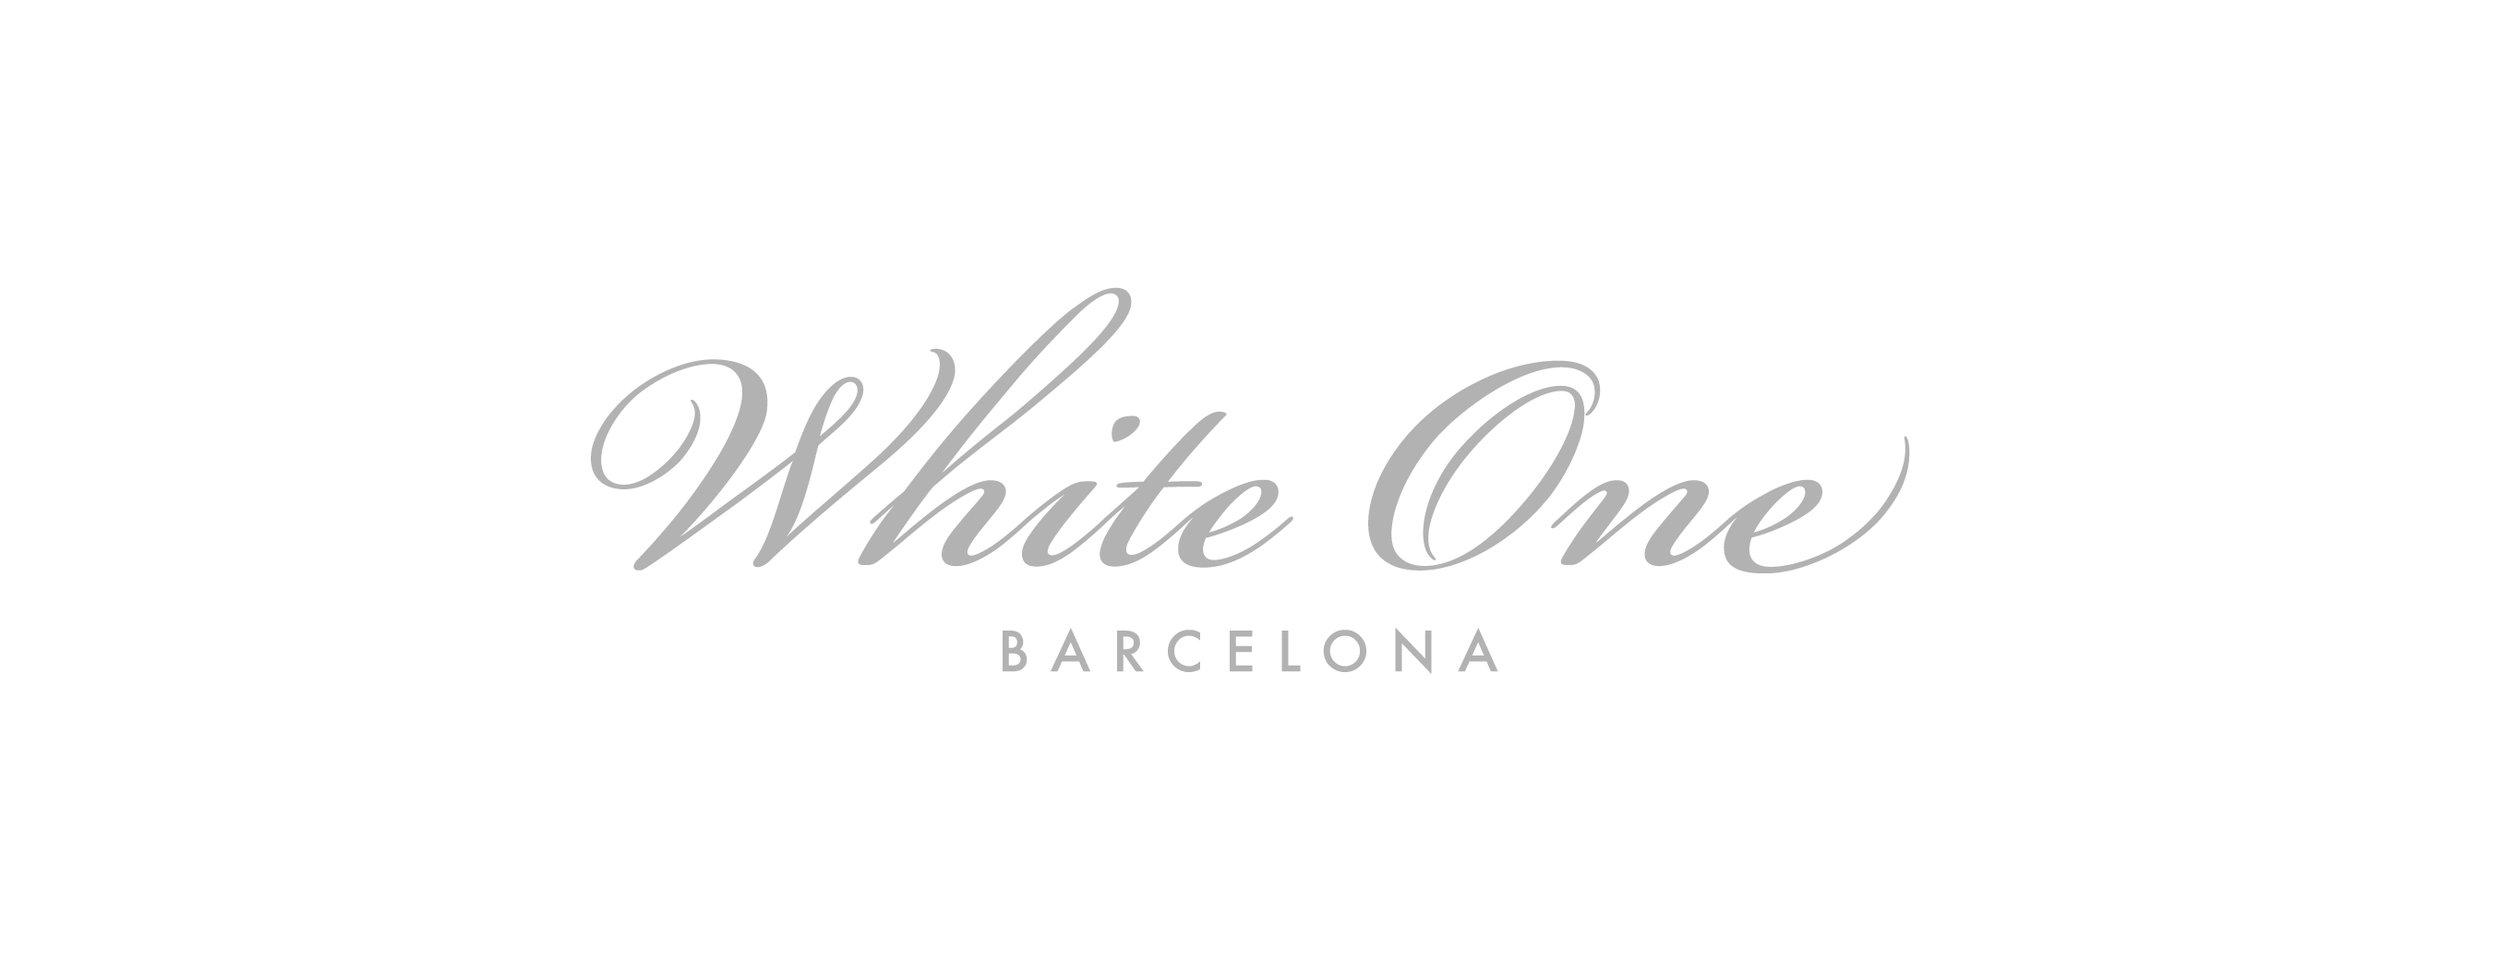 LOGO_WHITE_ONE_COLOR_SILVER_18.jpg